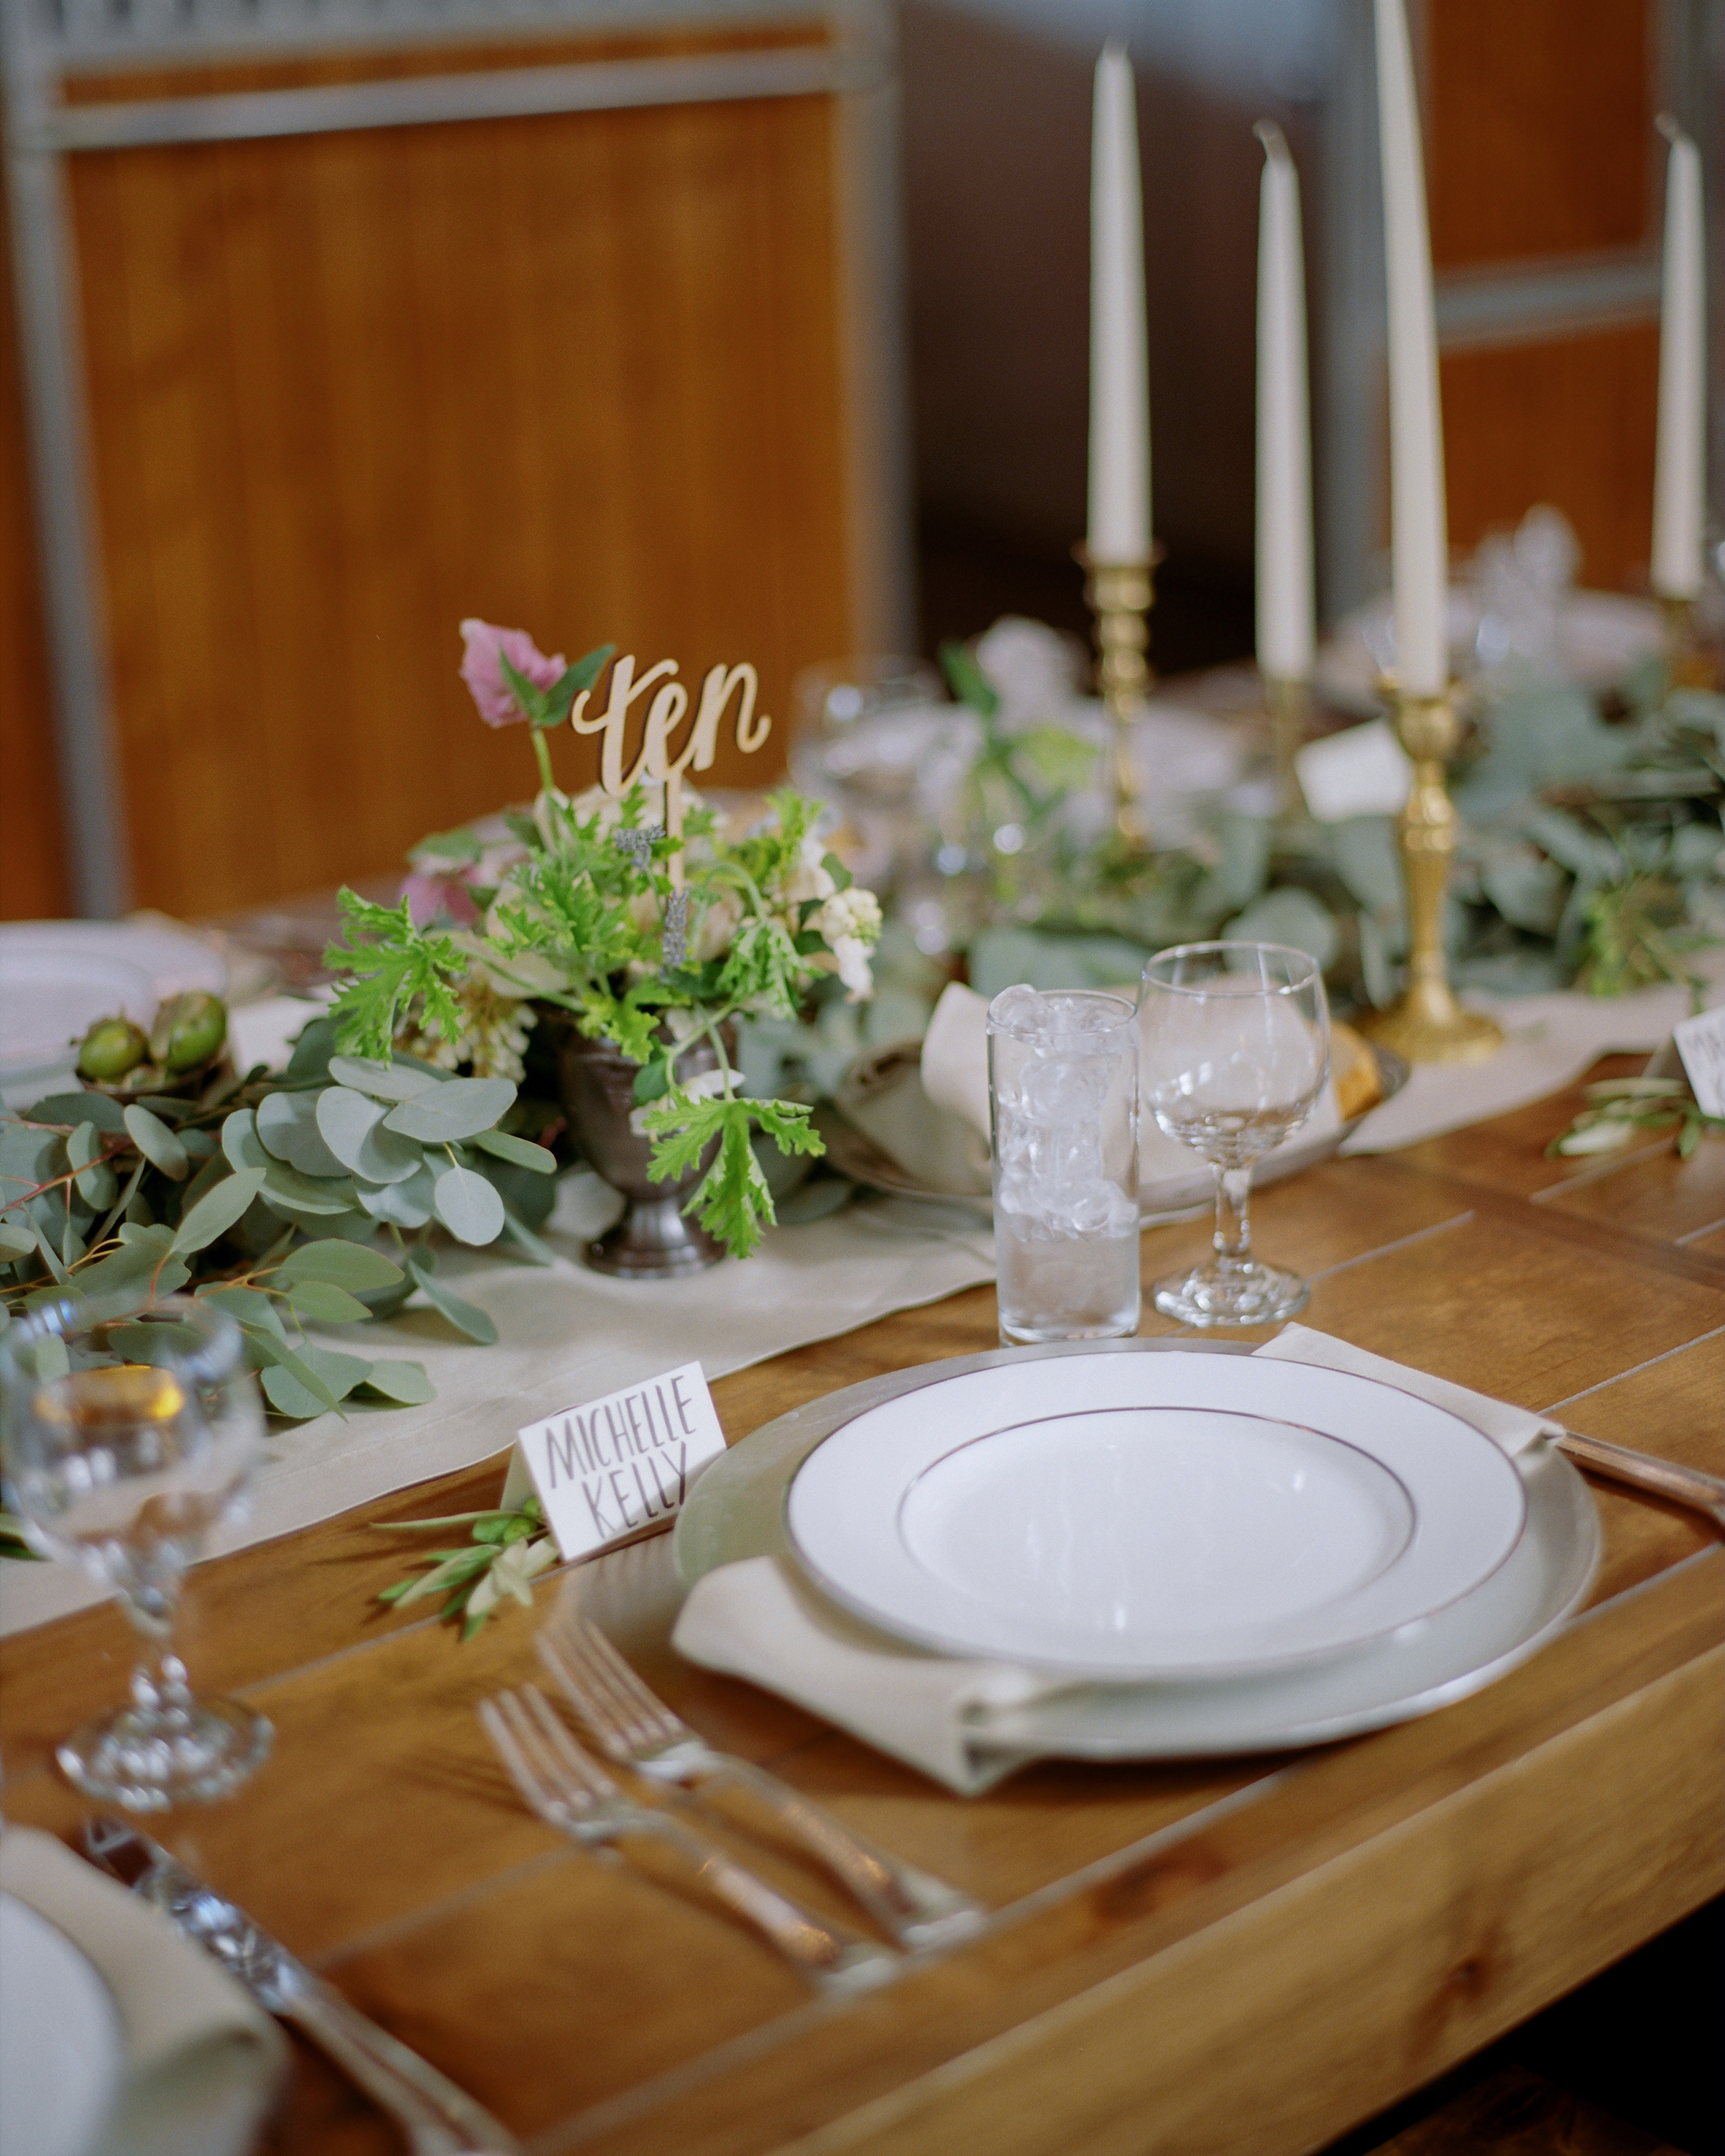 lizzy-pat-wedding-placesetting-150-s111777-0115.jpg